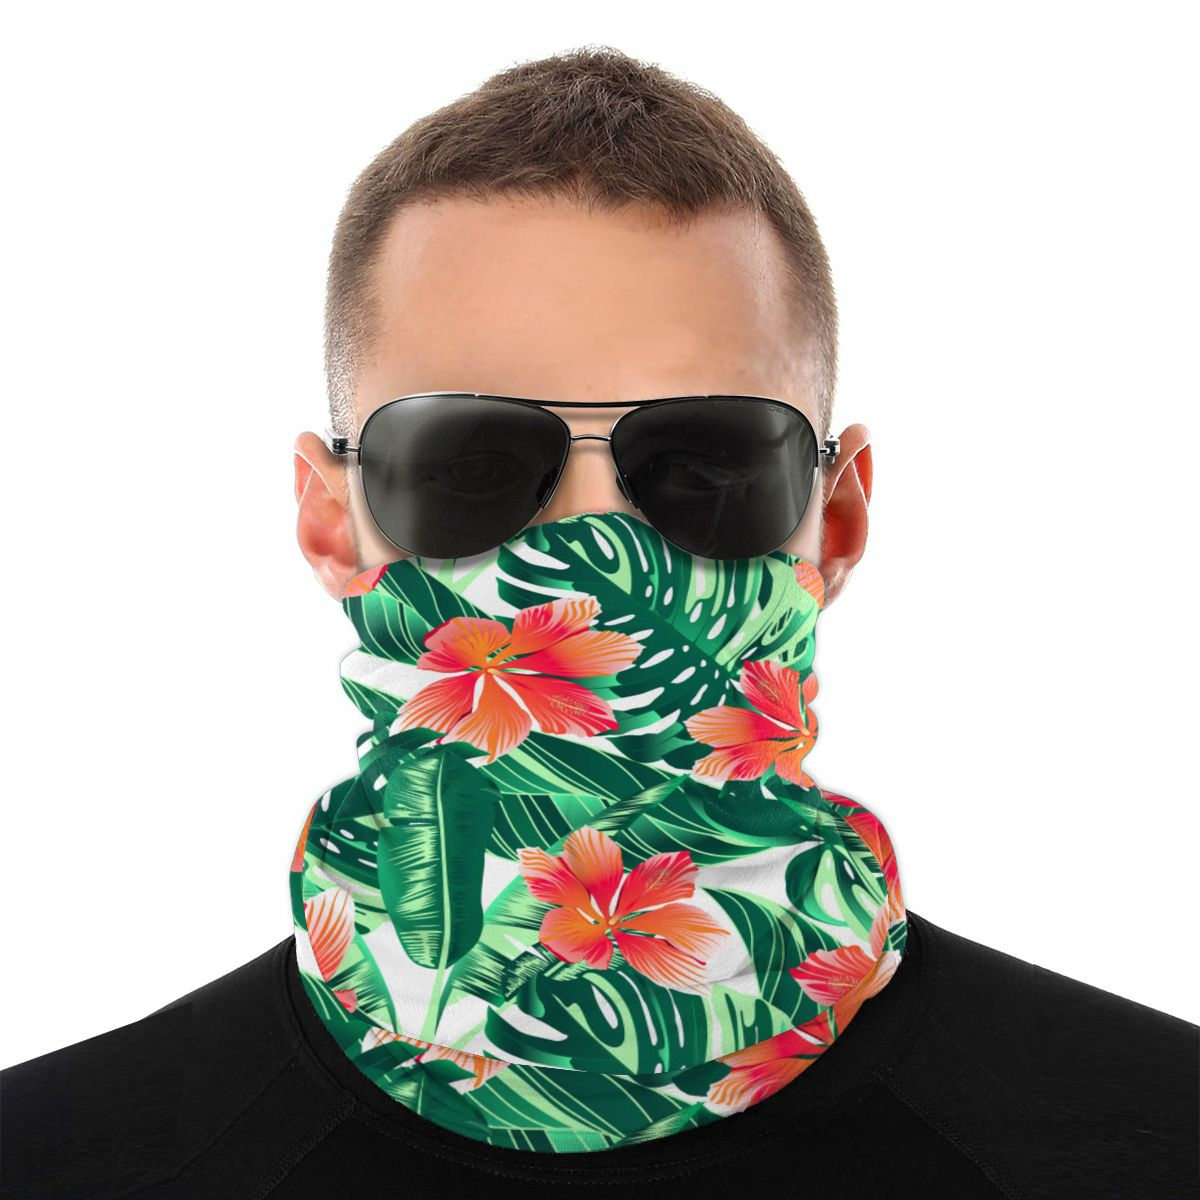 Bufanda Tropical naranja hibisco máscara de media cara cuello polaina flor Paraíso sin costuras Bandanas versatilidad Headwear ciclismo Camping